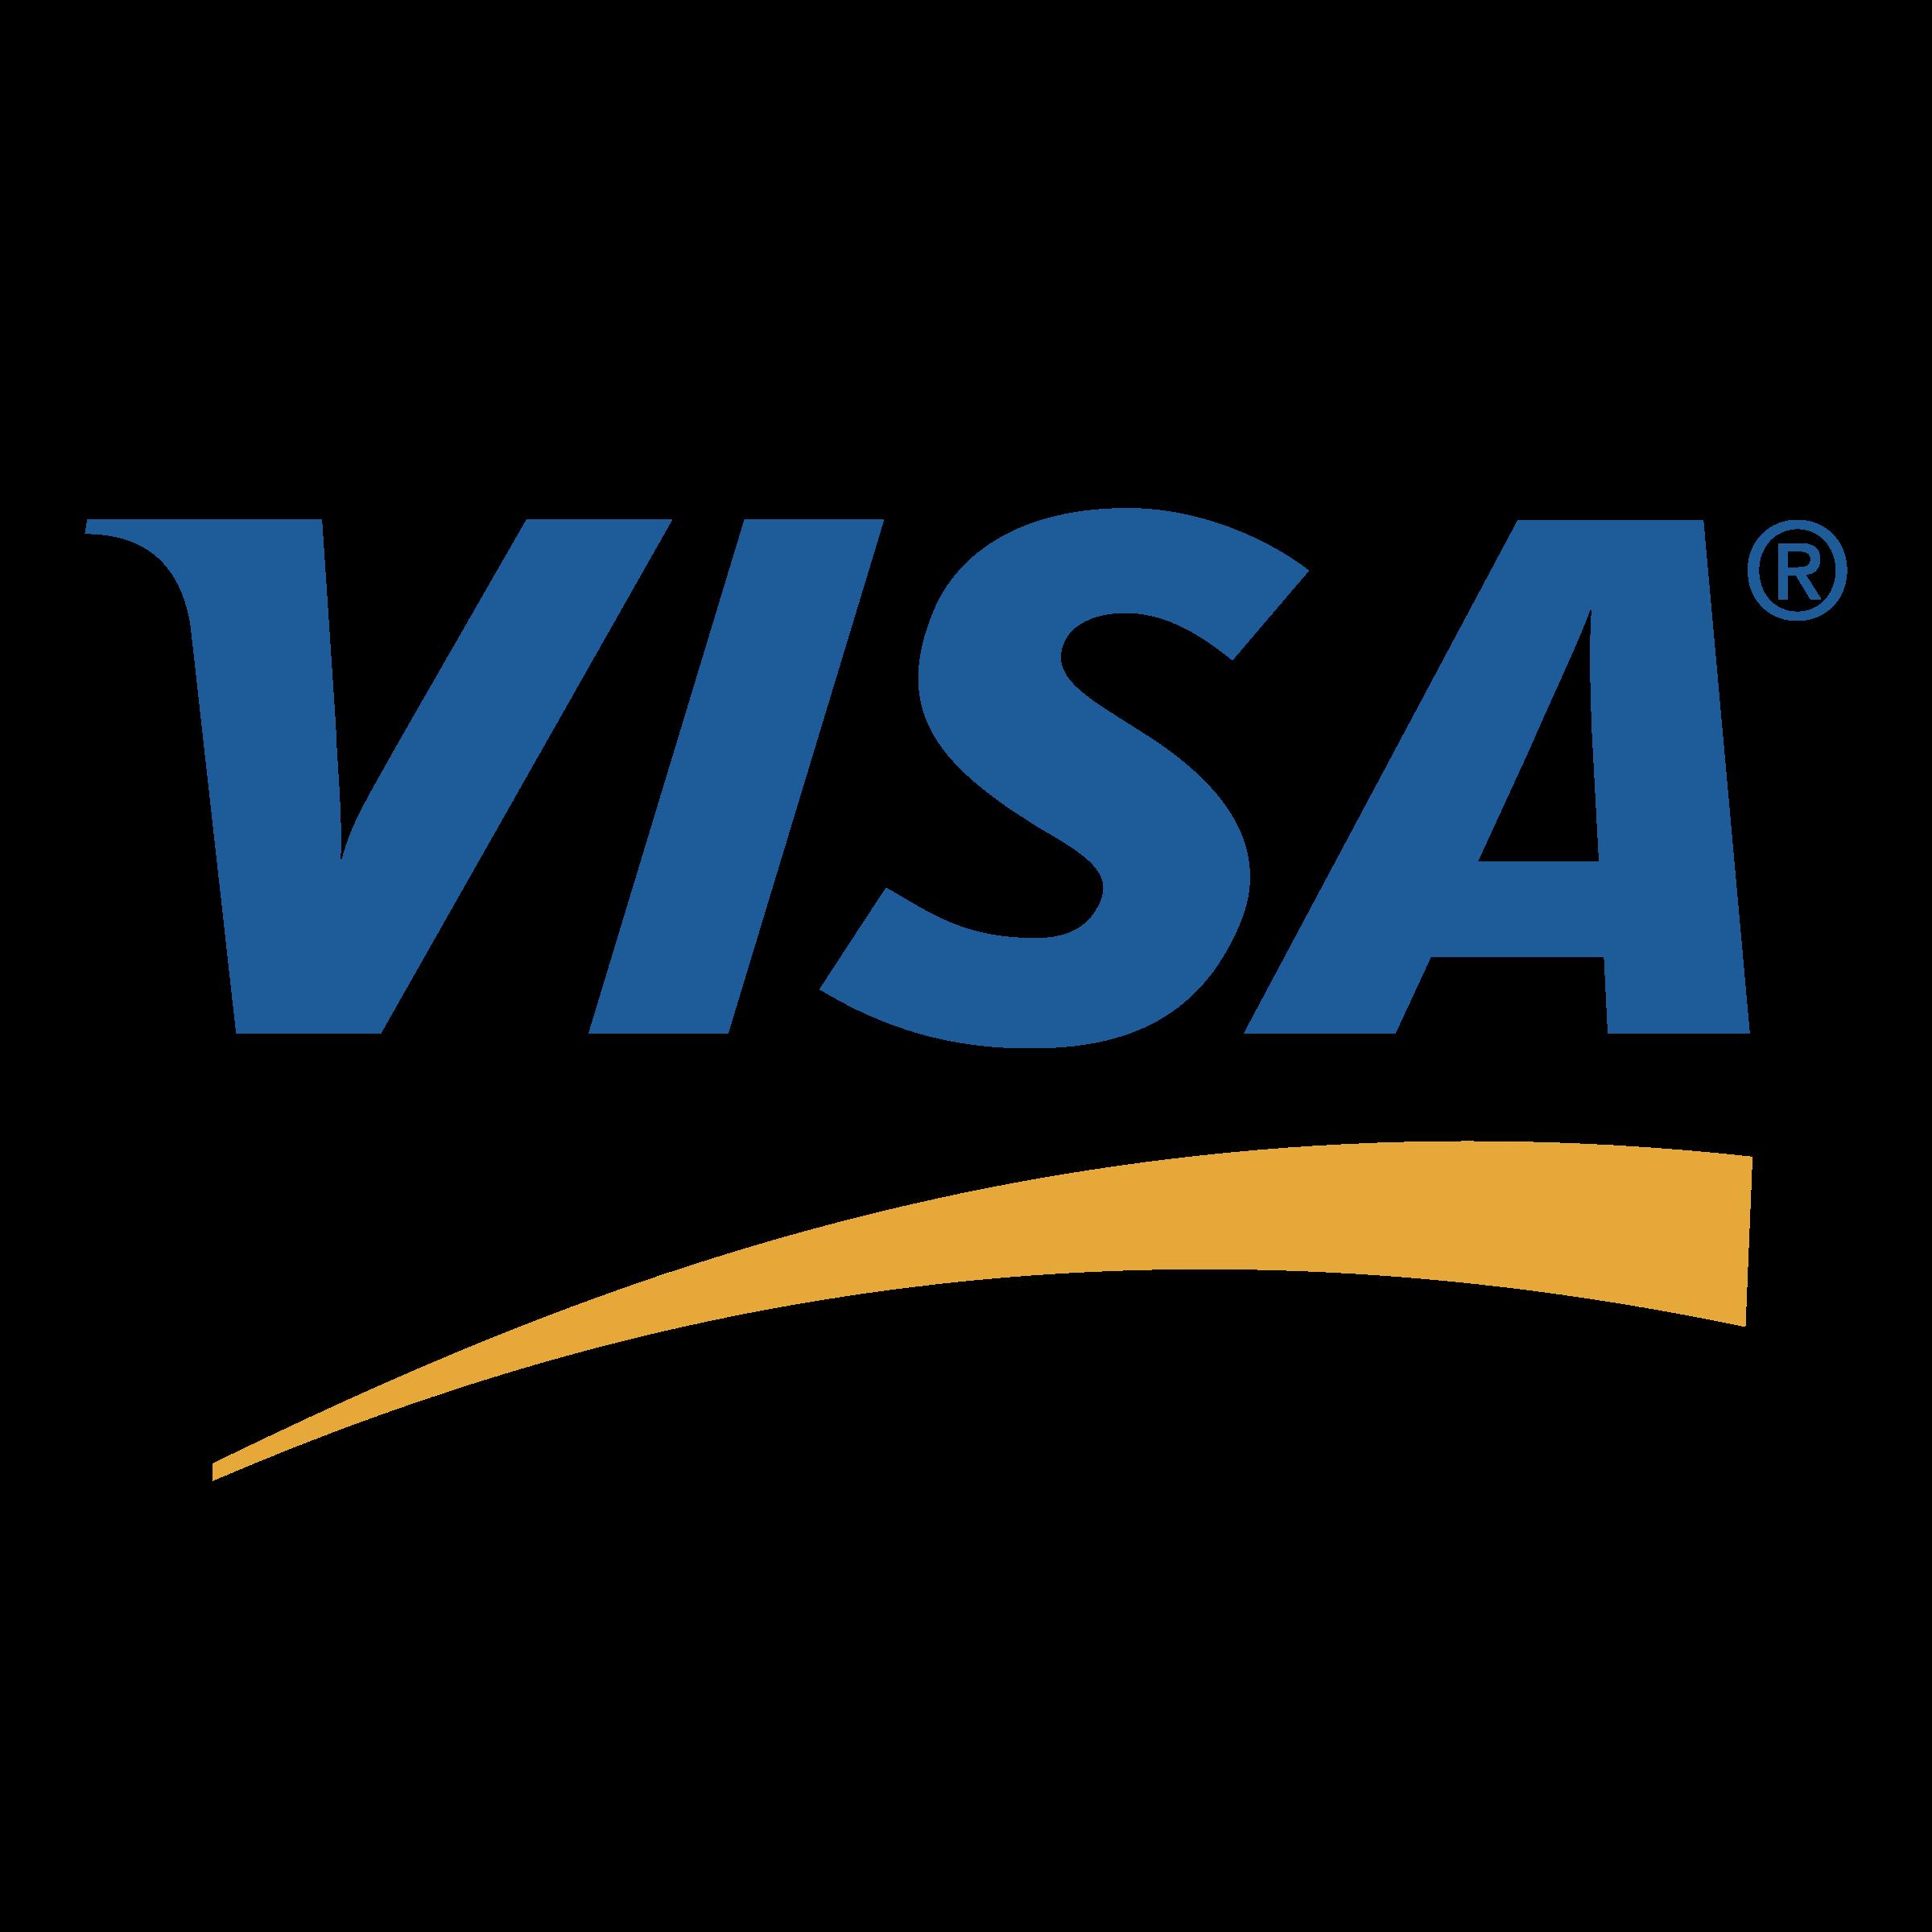 казино оплата виза